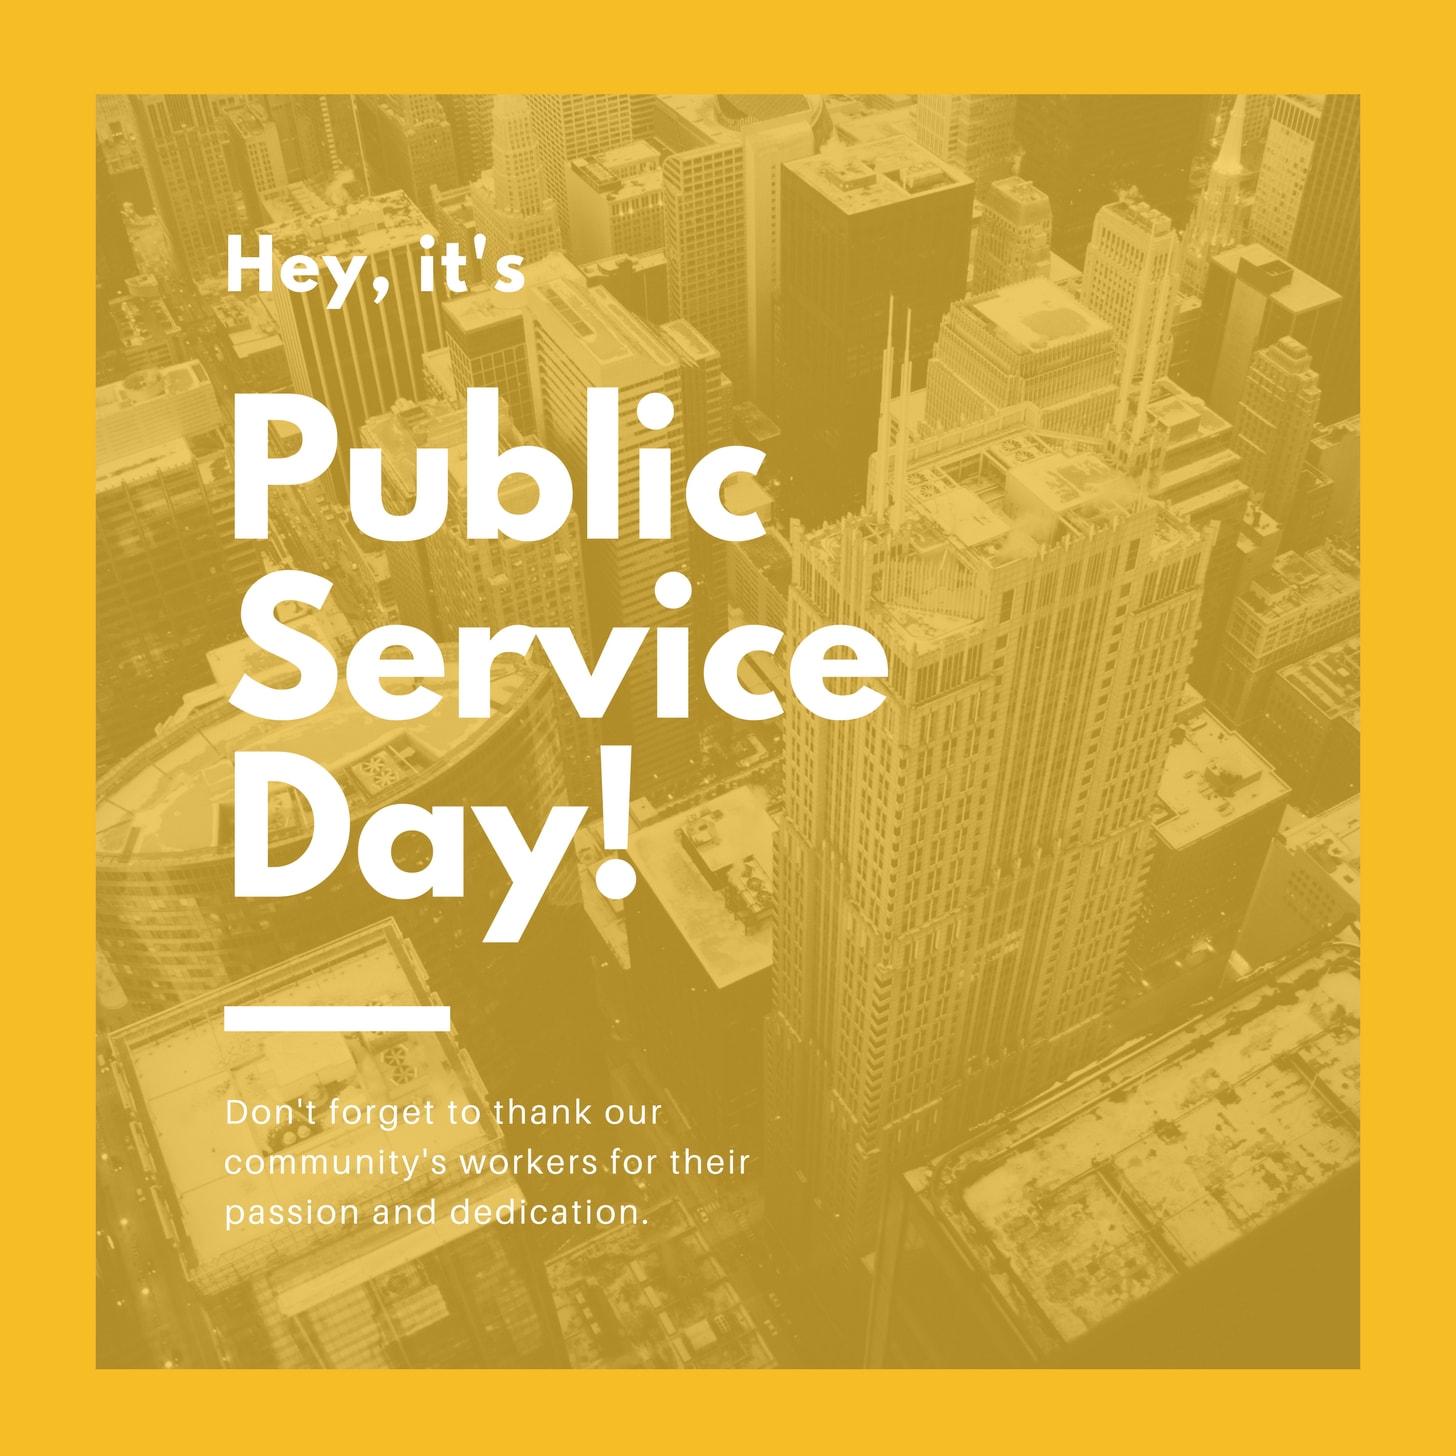 Yellow City Photo Public Service Day Social Media Graphic